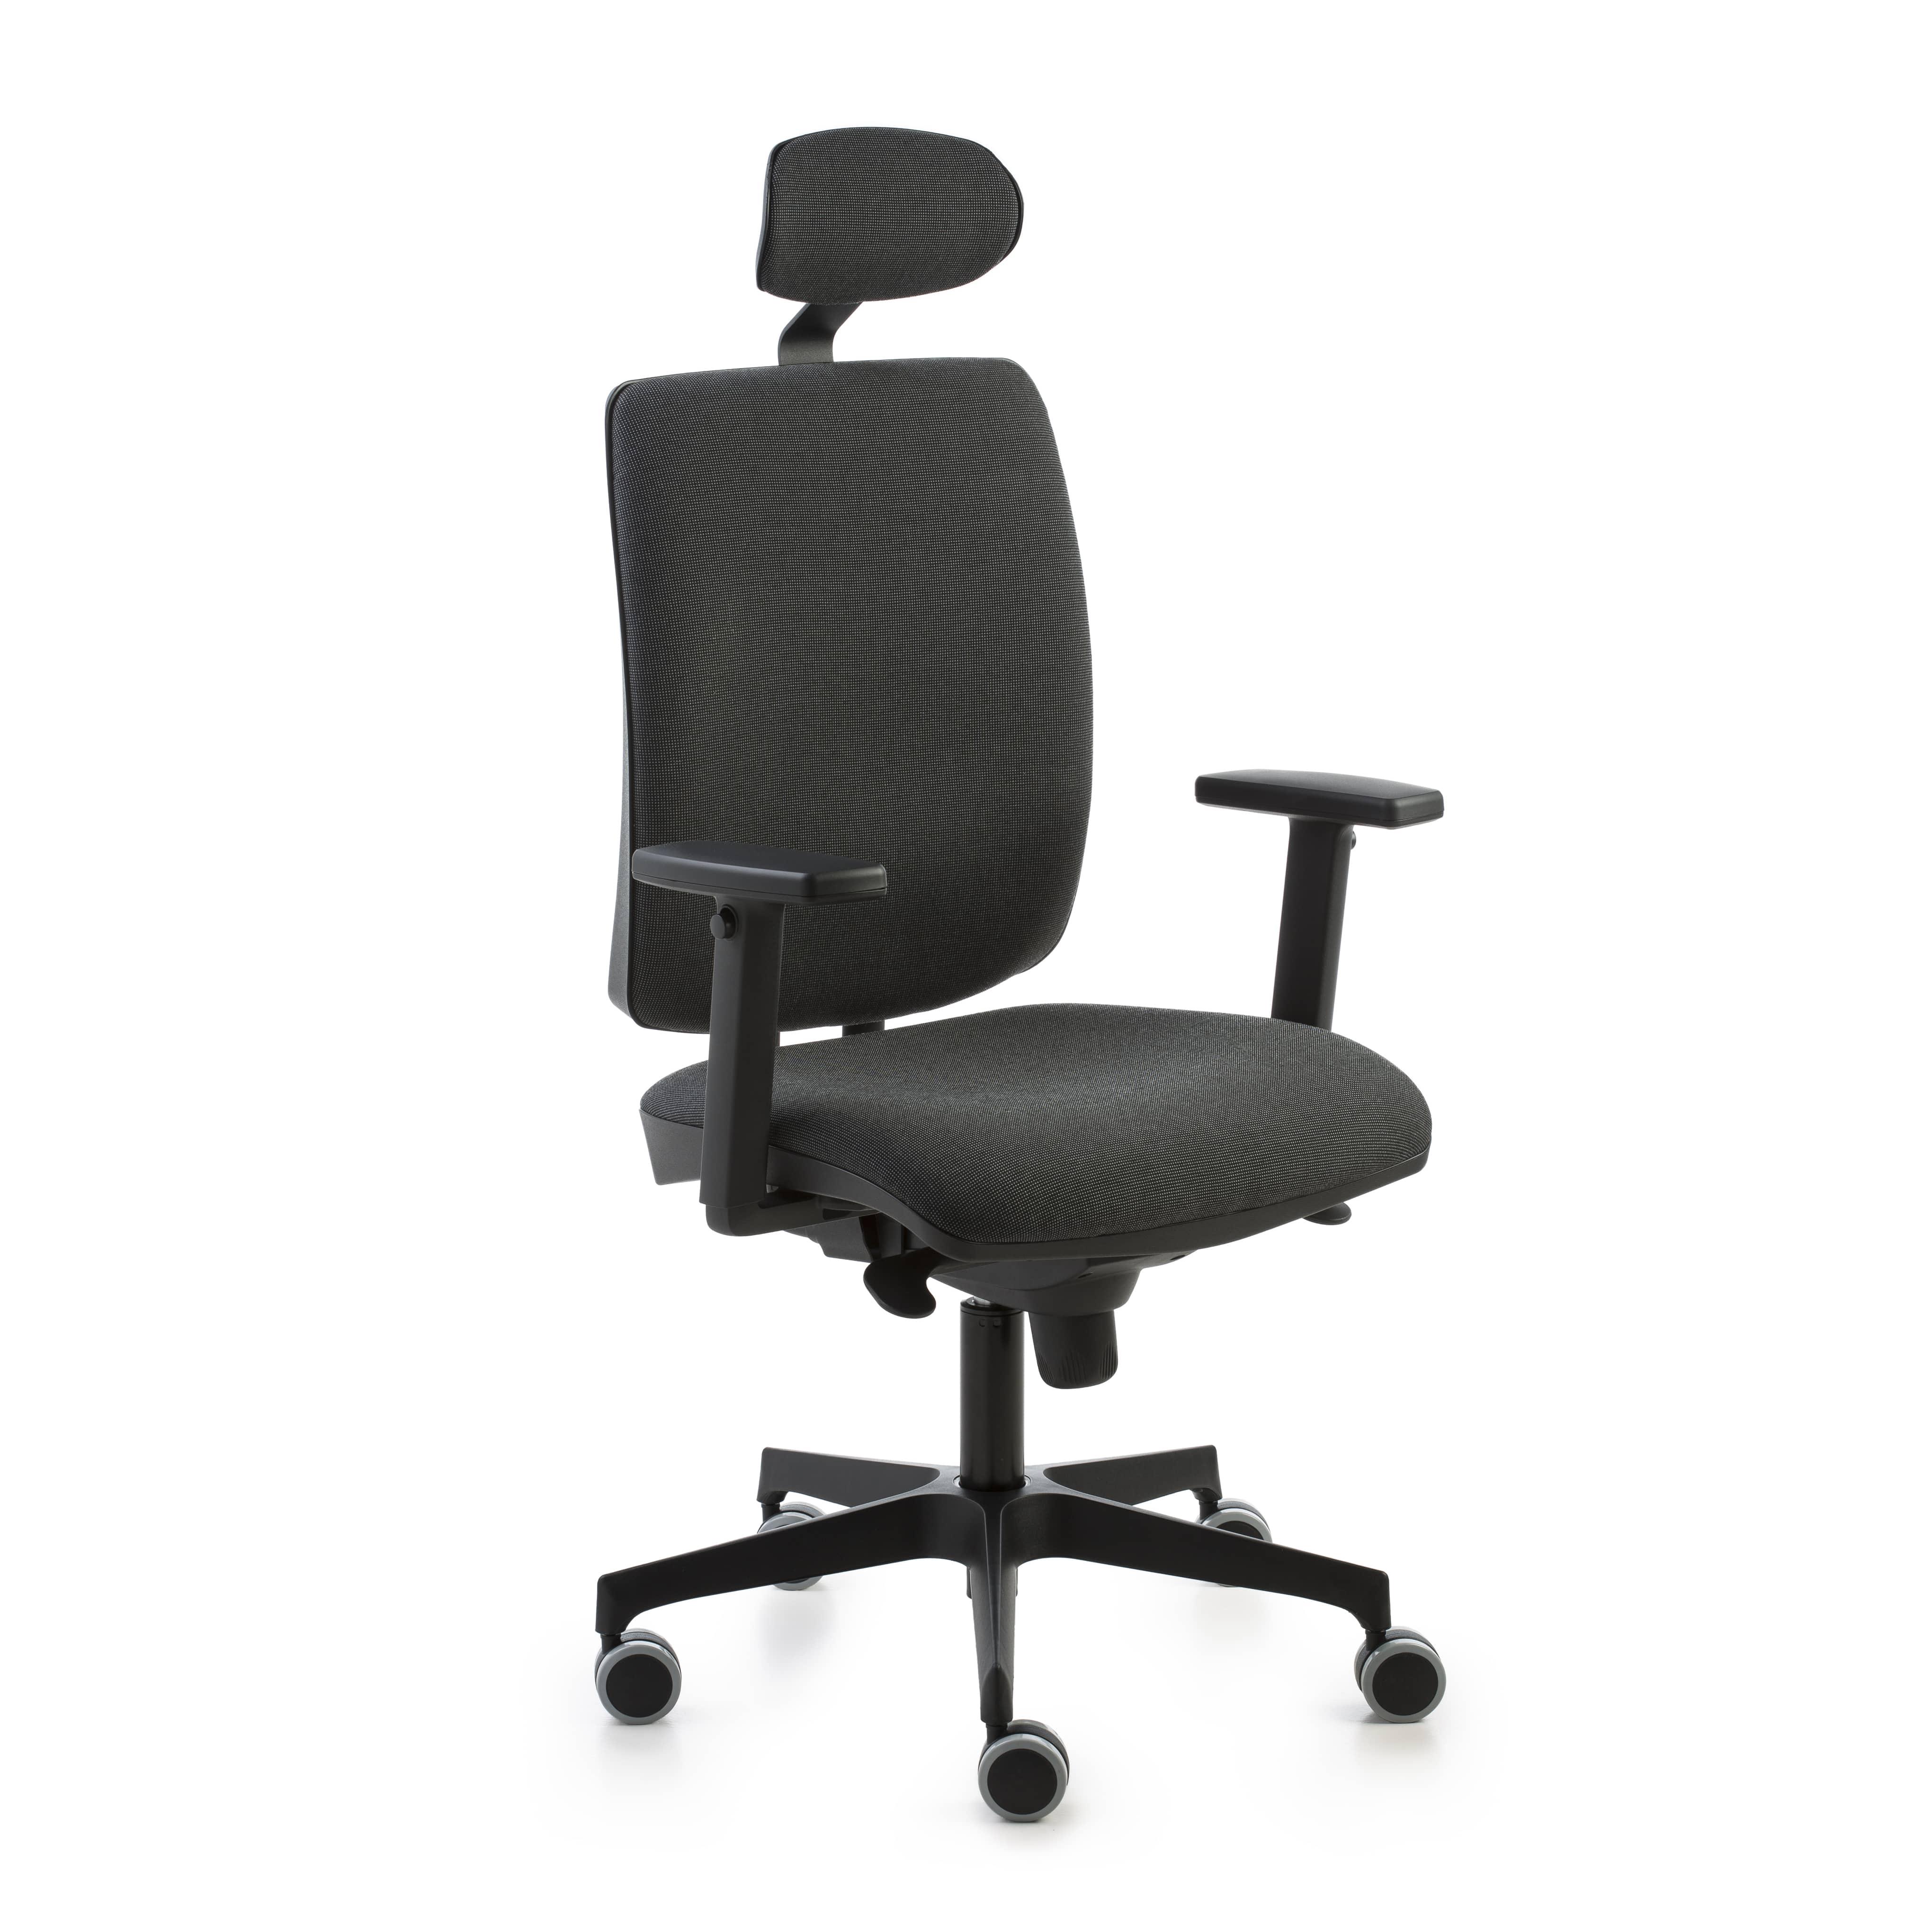 sillas-oficina-General-muebles-paco-caballero-454-5caf5d95c70da